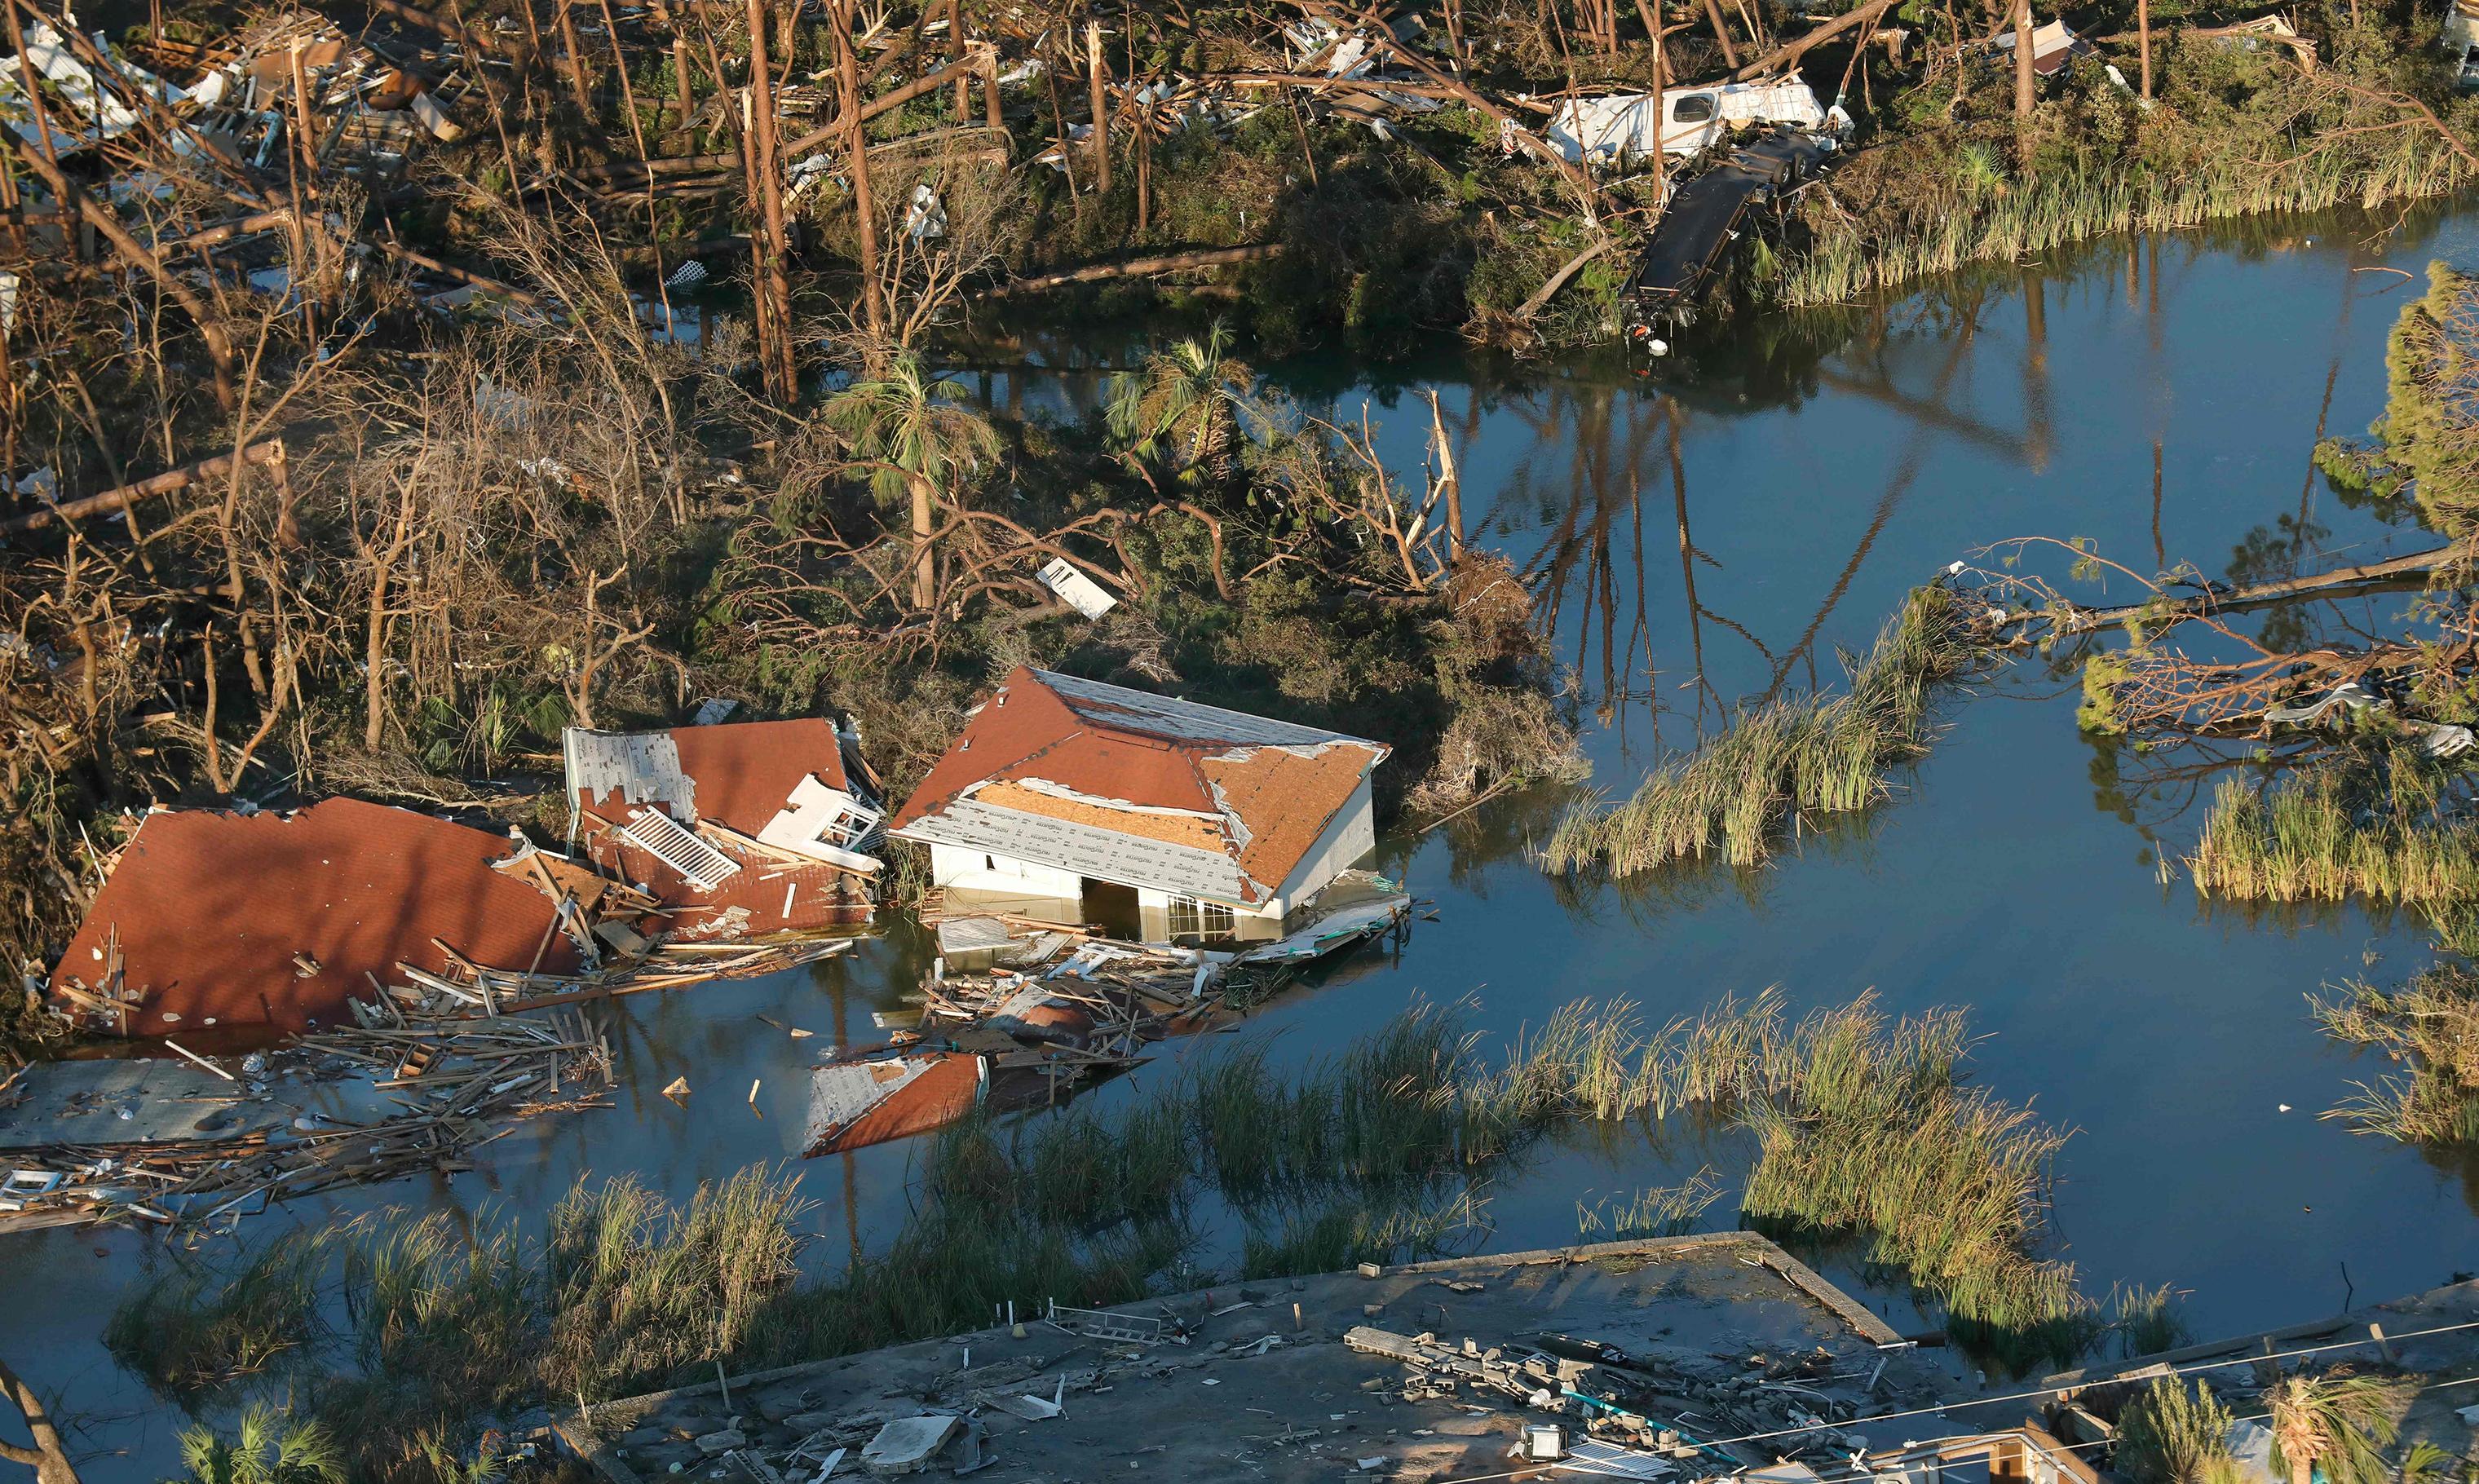 Hurricane Michael left massive destruction across the area near Panama City, Fla., on Oct. 11, 2018.